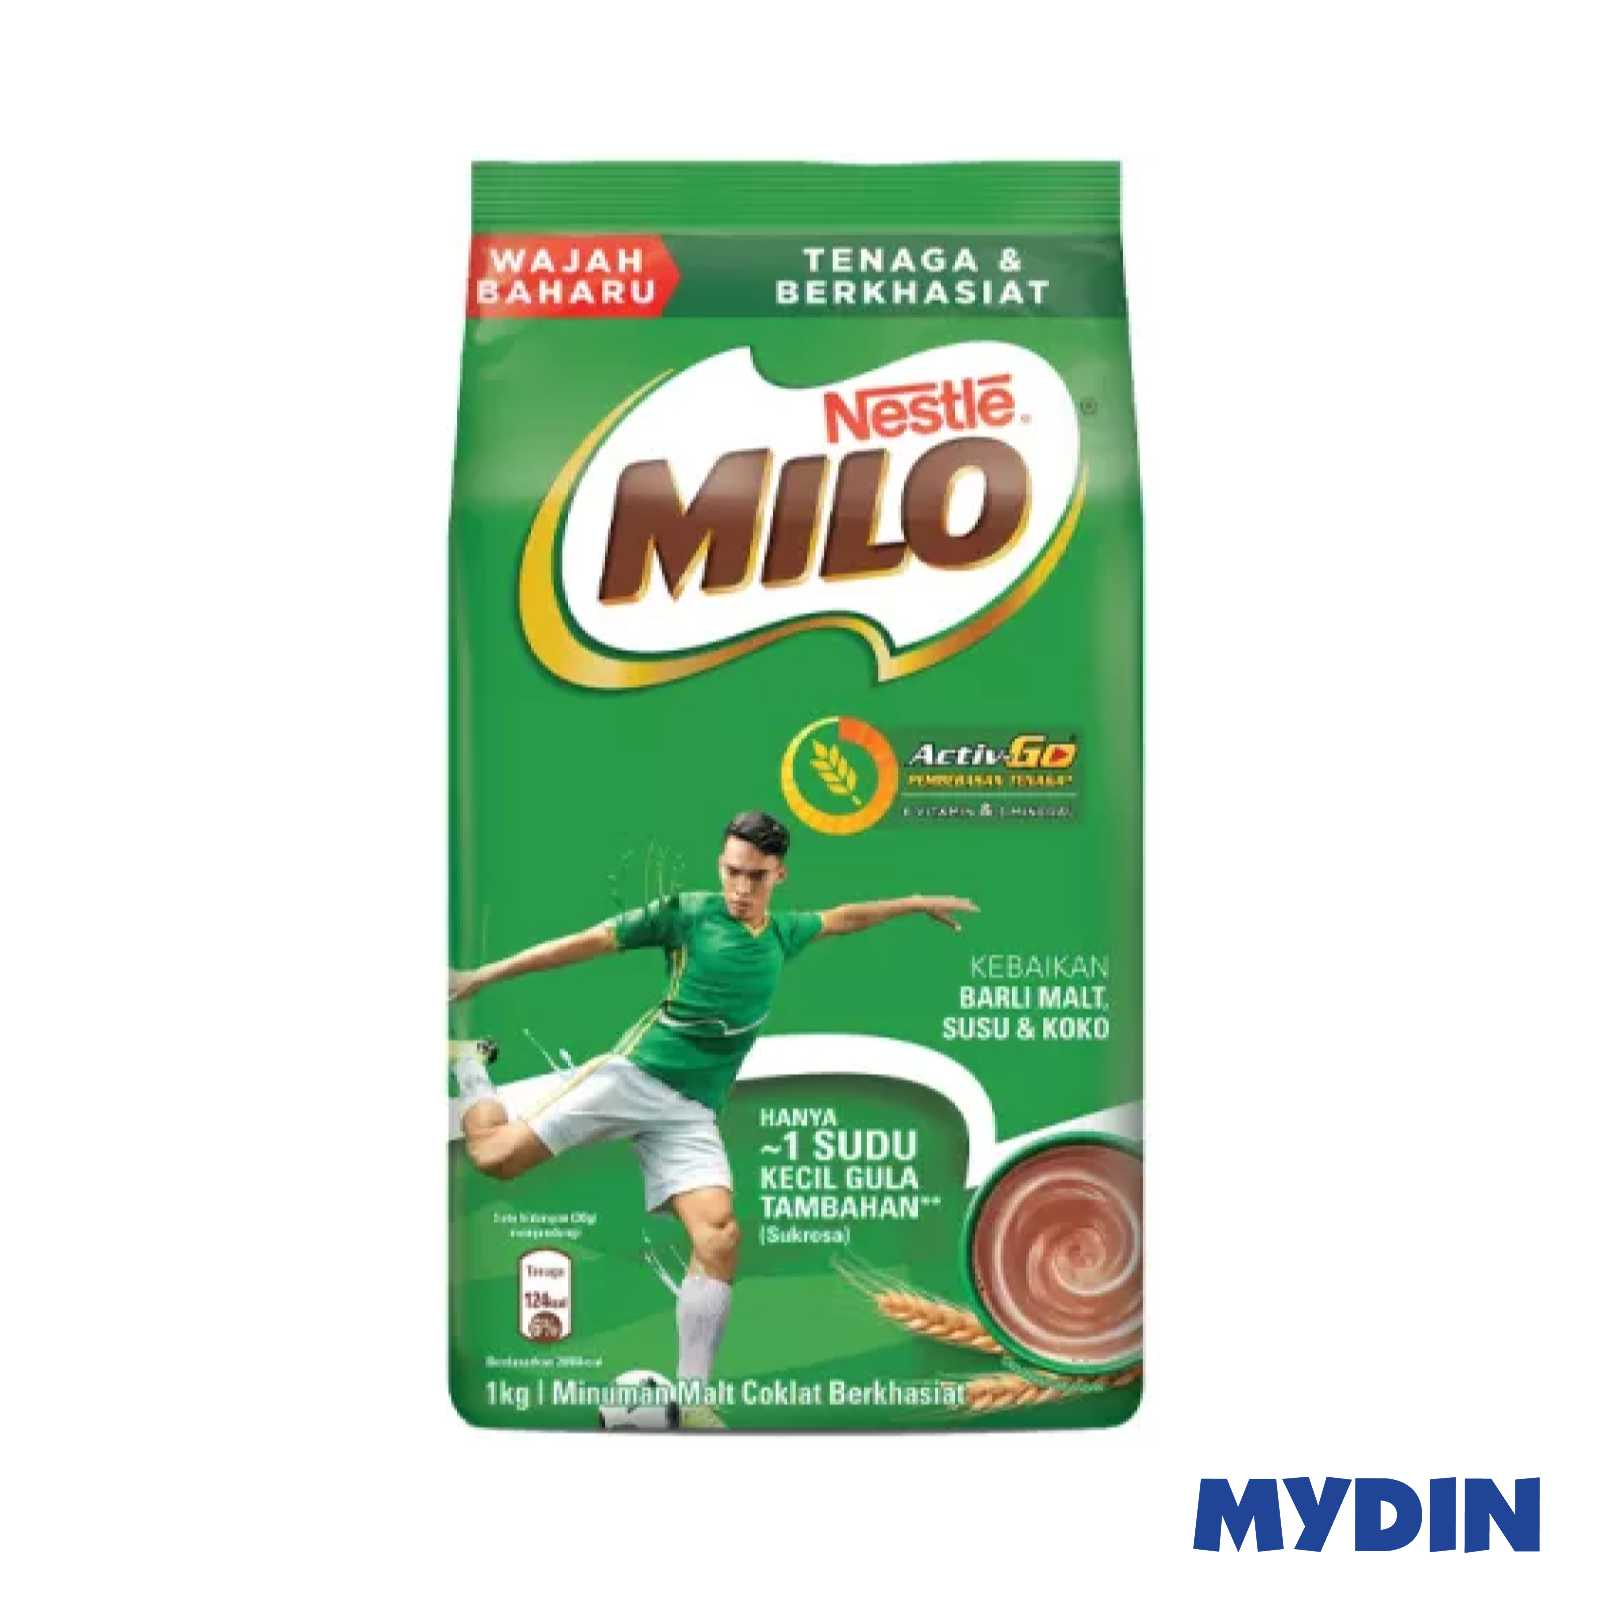 Nestle Milo Activ-Go FOC 100g (1.1Kg)